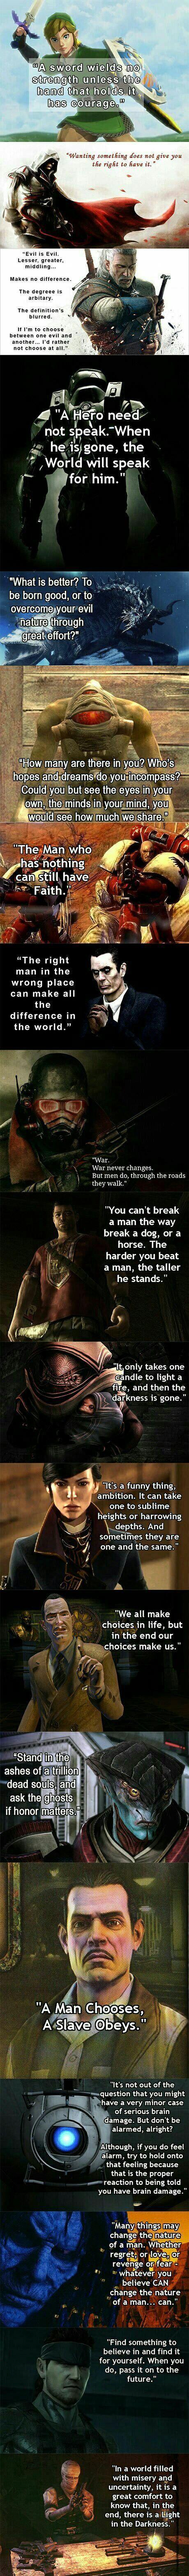 19 Amazing Video Game Quotes | 8 Bit Nerds